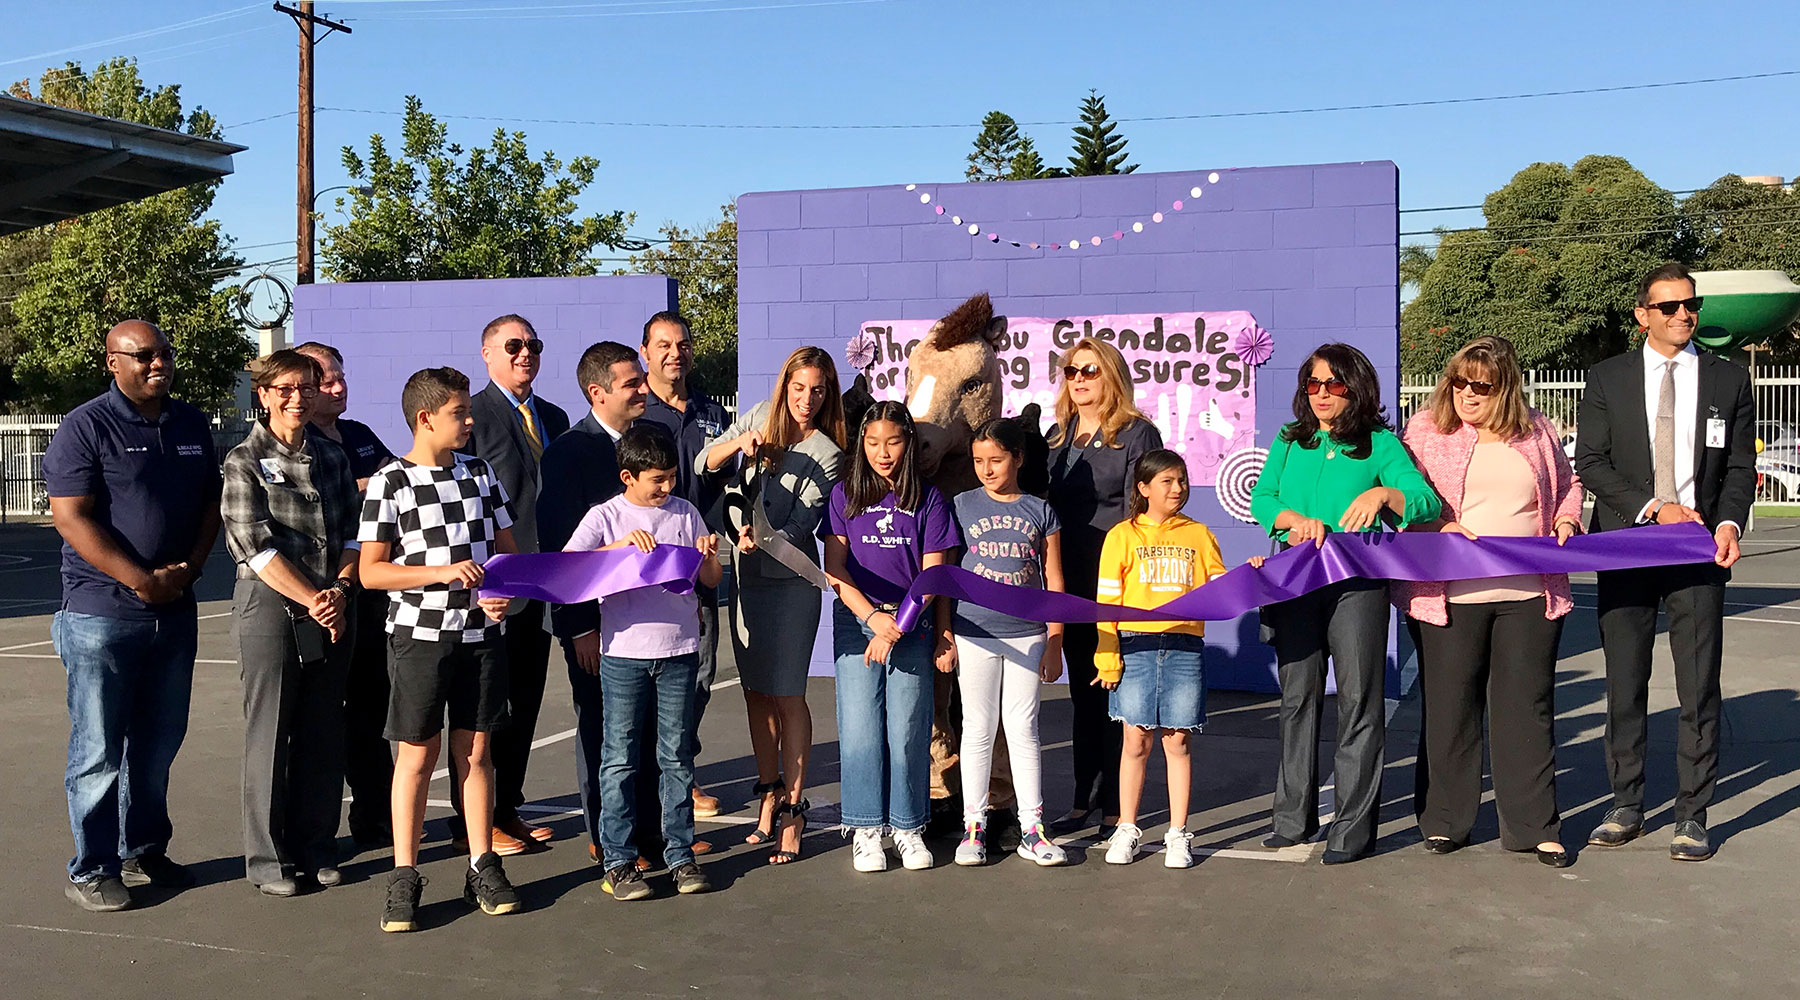 R.D. White Elementary School Playground Ribbon Cutting Ceremony